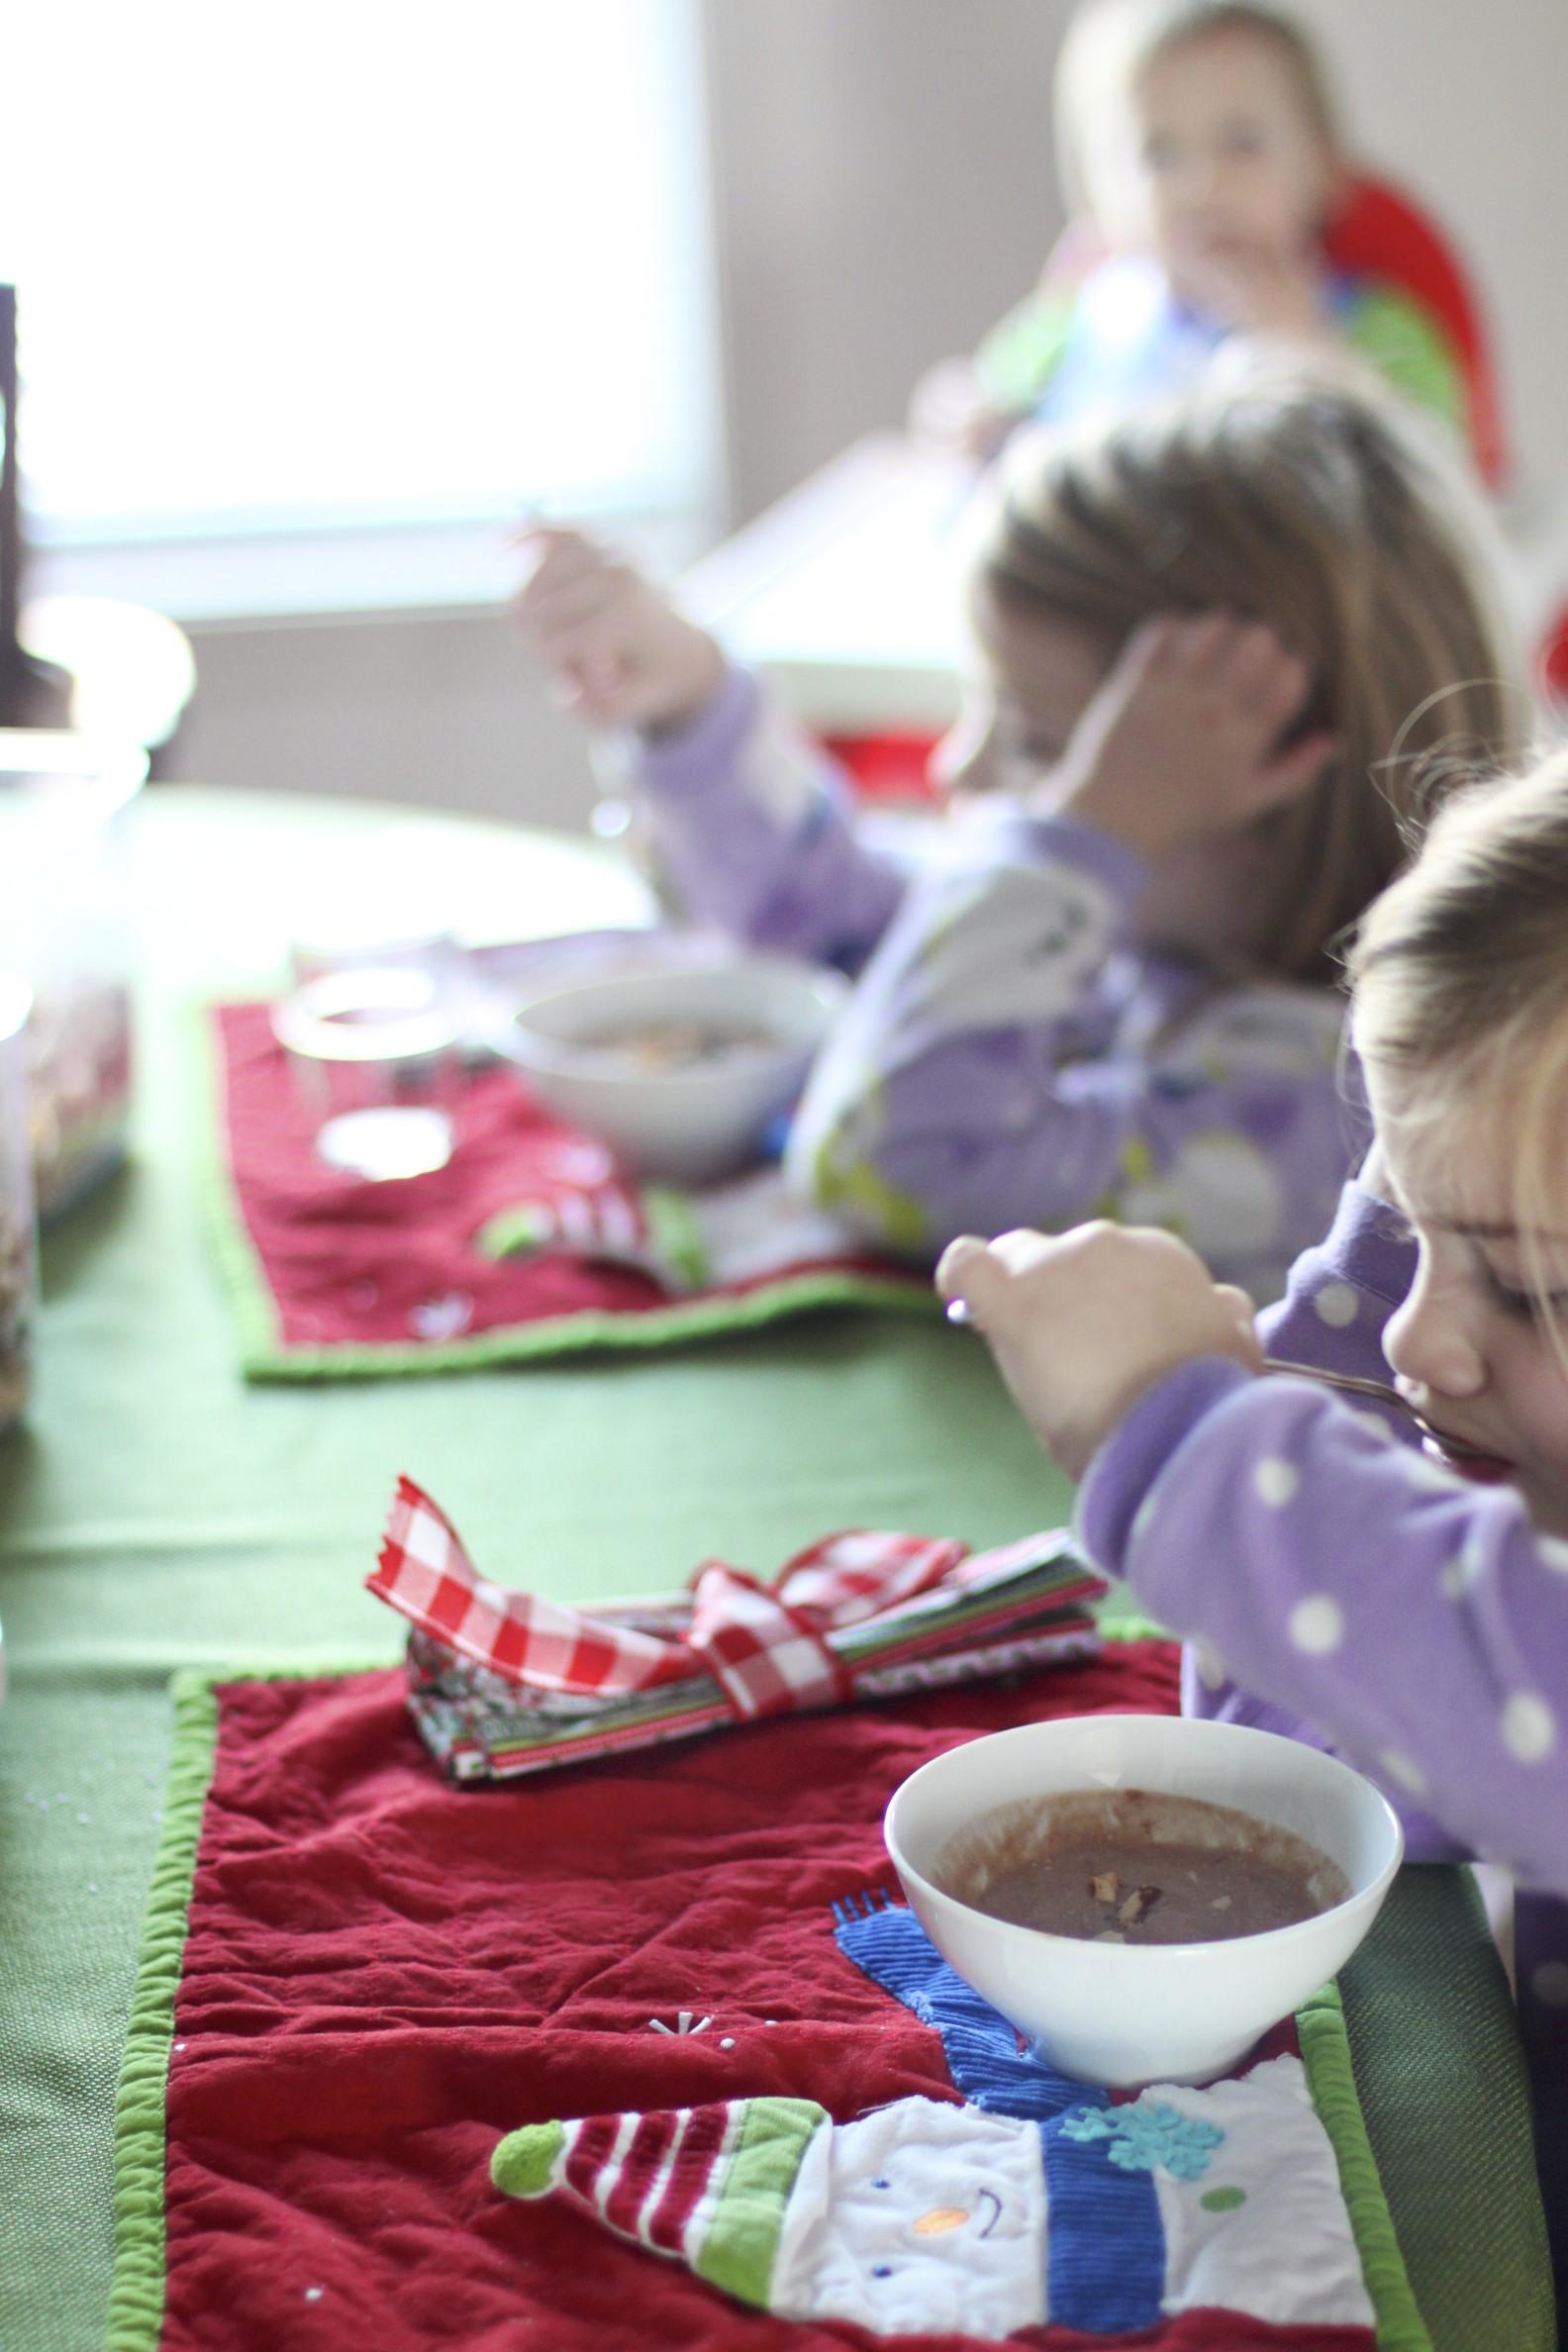 low carb/paleo kids: strawberry banana yogurt & chocolate yogurt